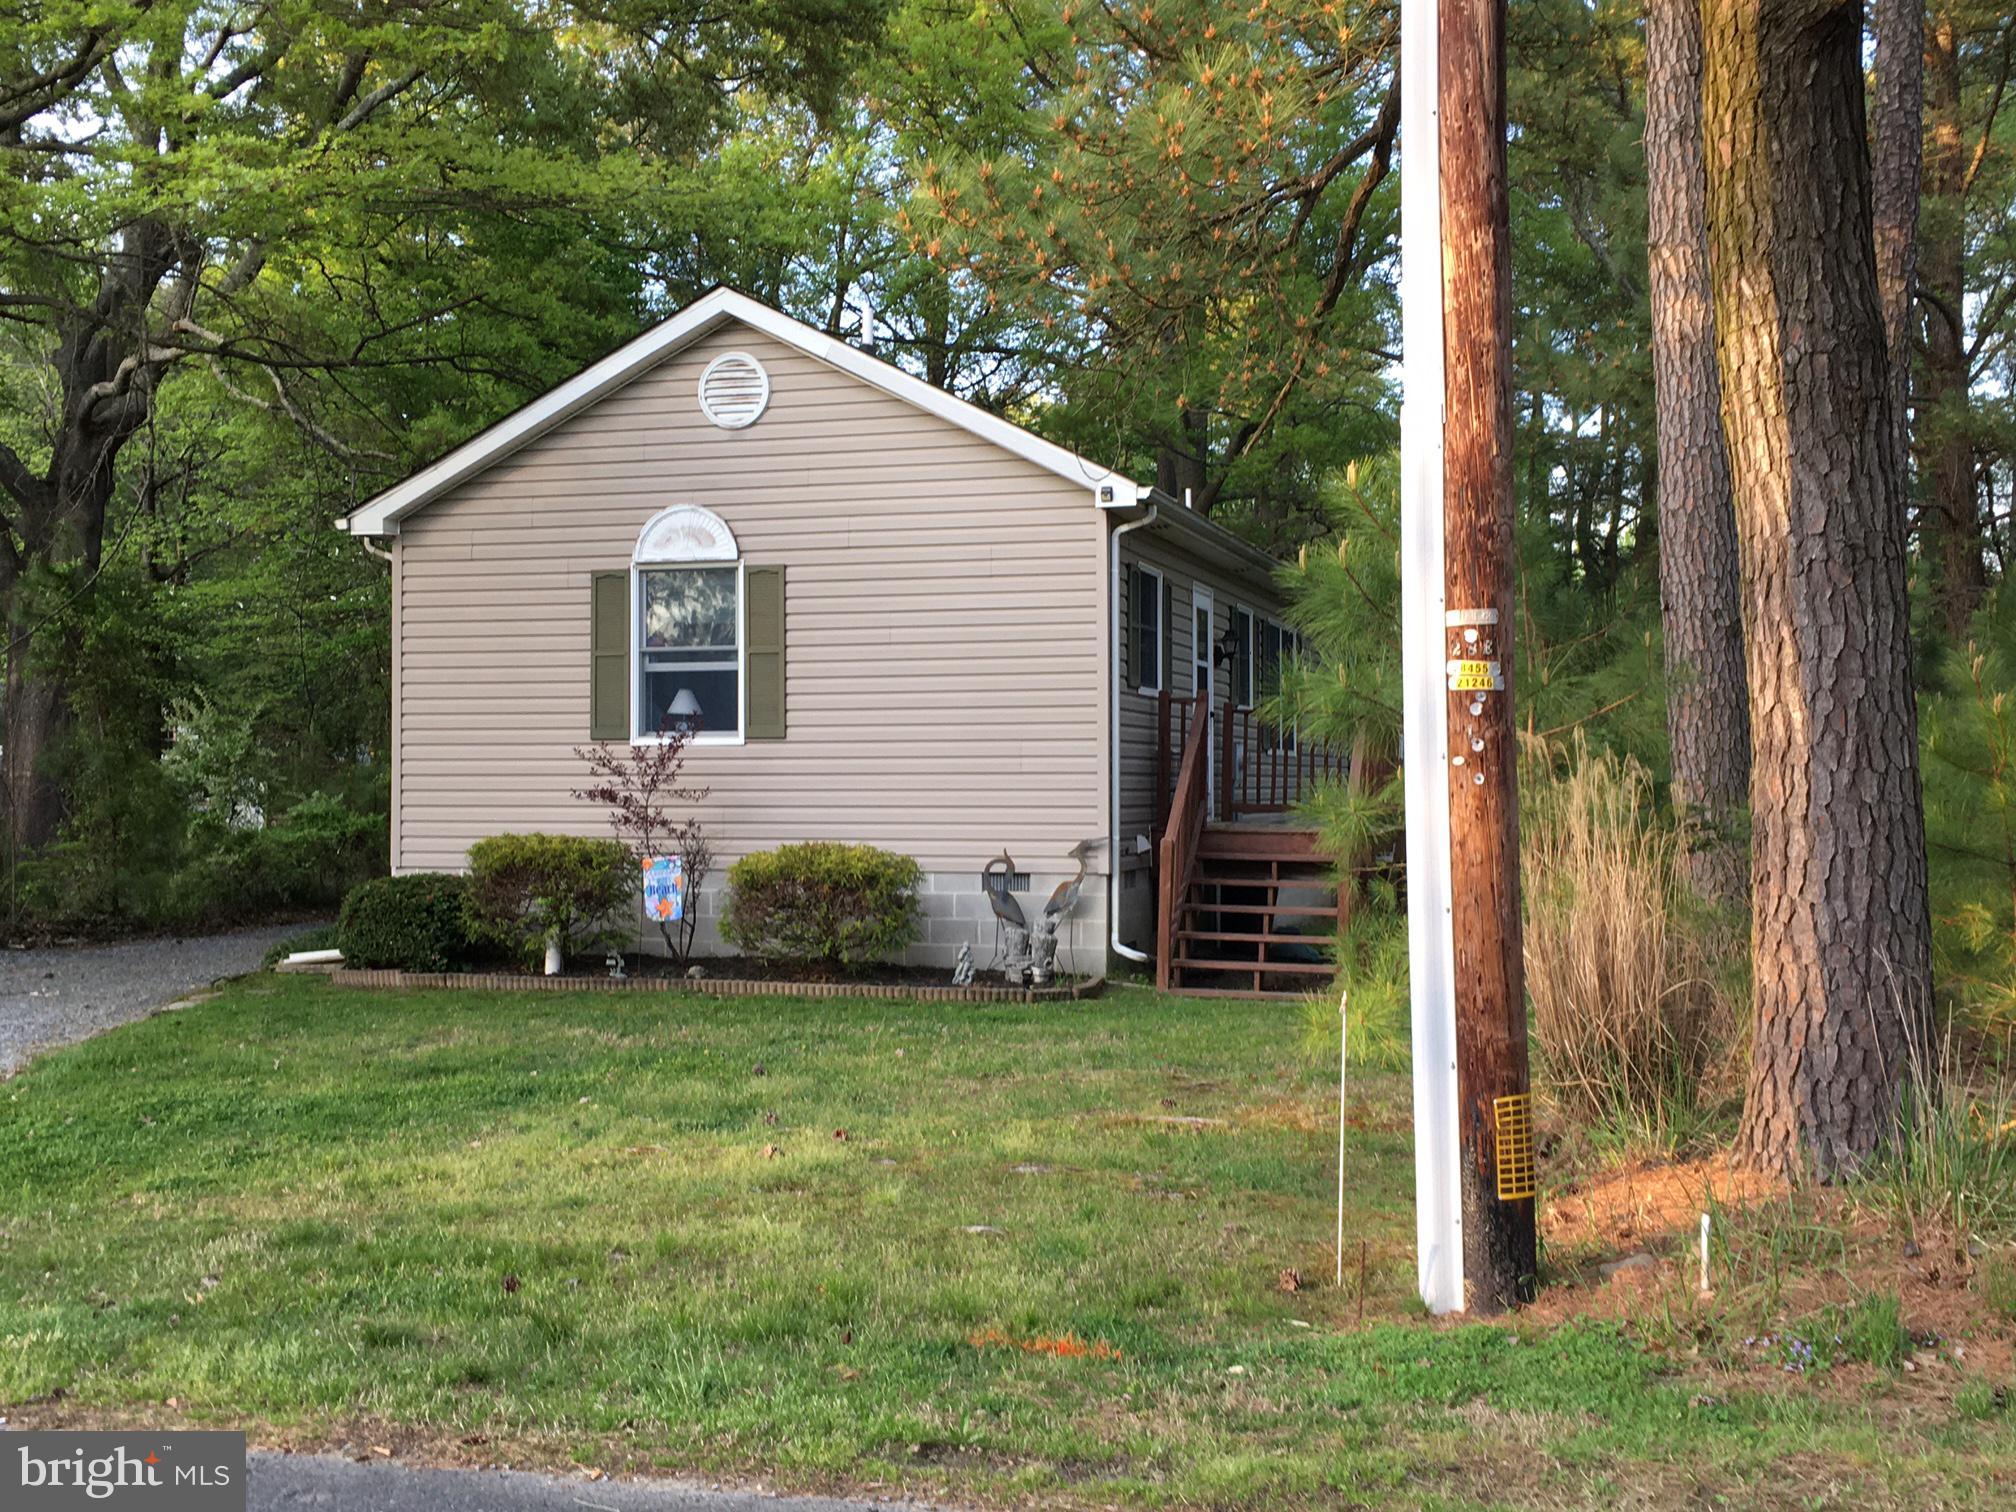 20730 BAYSIDE AVENUE, ROCK HALL, Maryland 21661, 2 Bedrooms Bedrooms, ,2 BathroomsBathrooms,Single Family,For Sale,20730 BAYSIDE AVENUE,MDKE118034